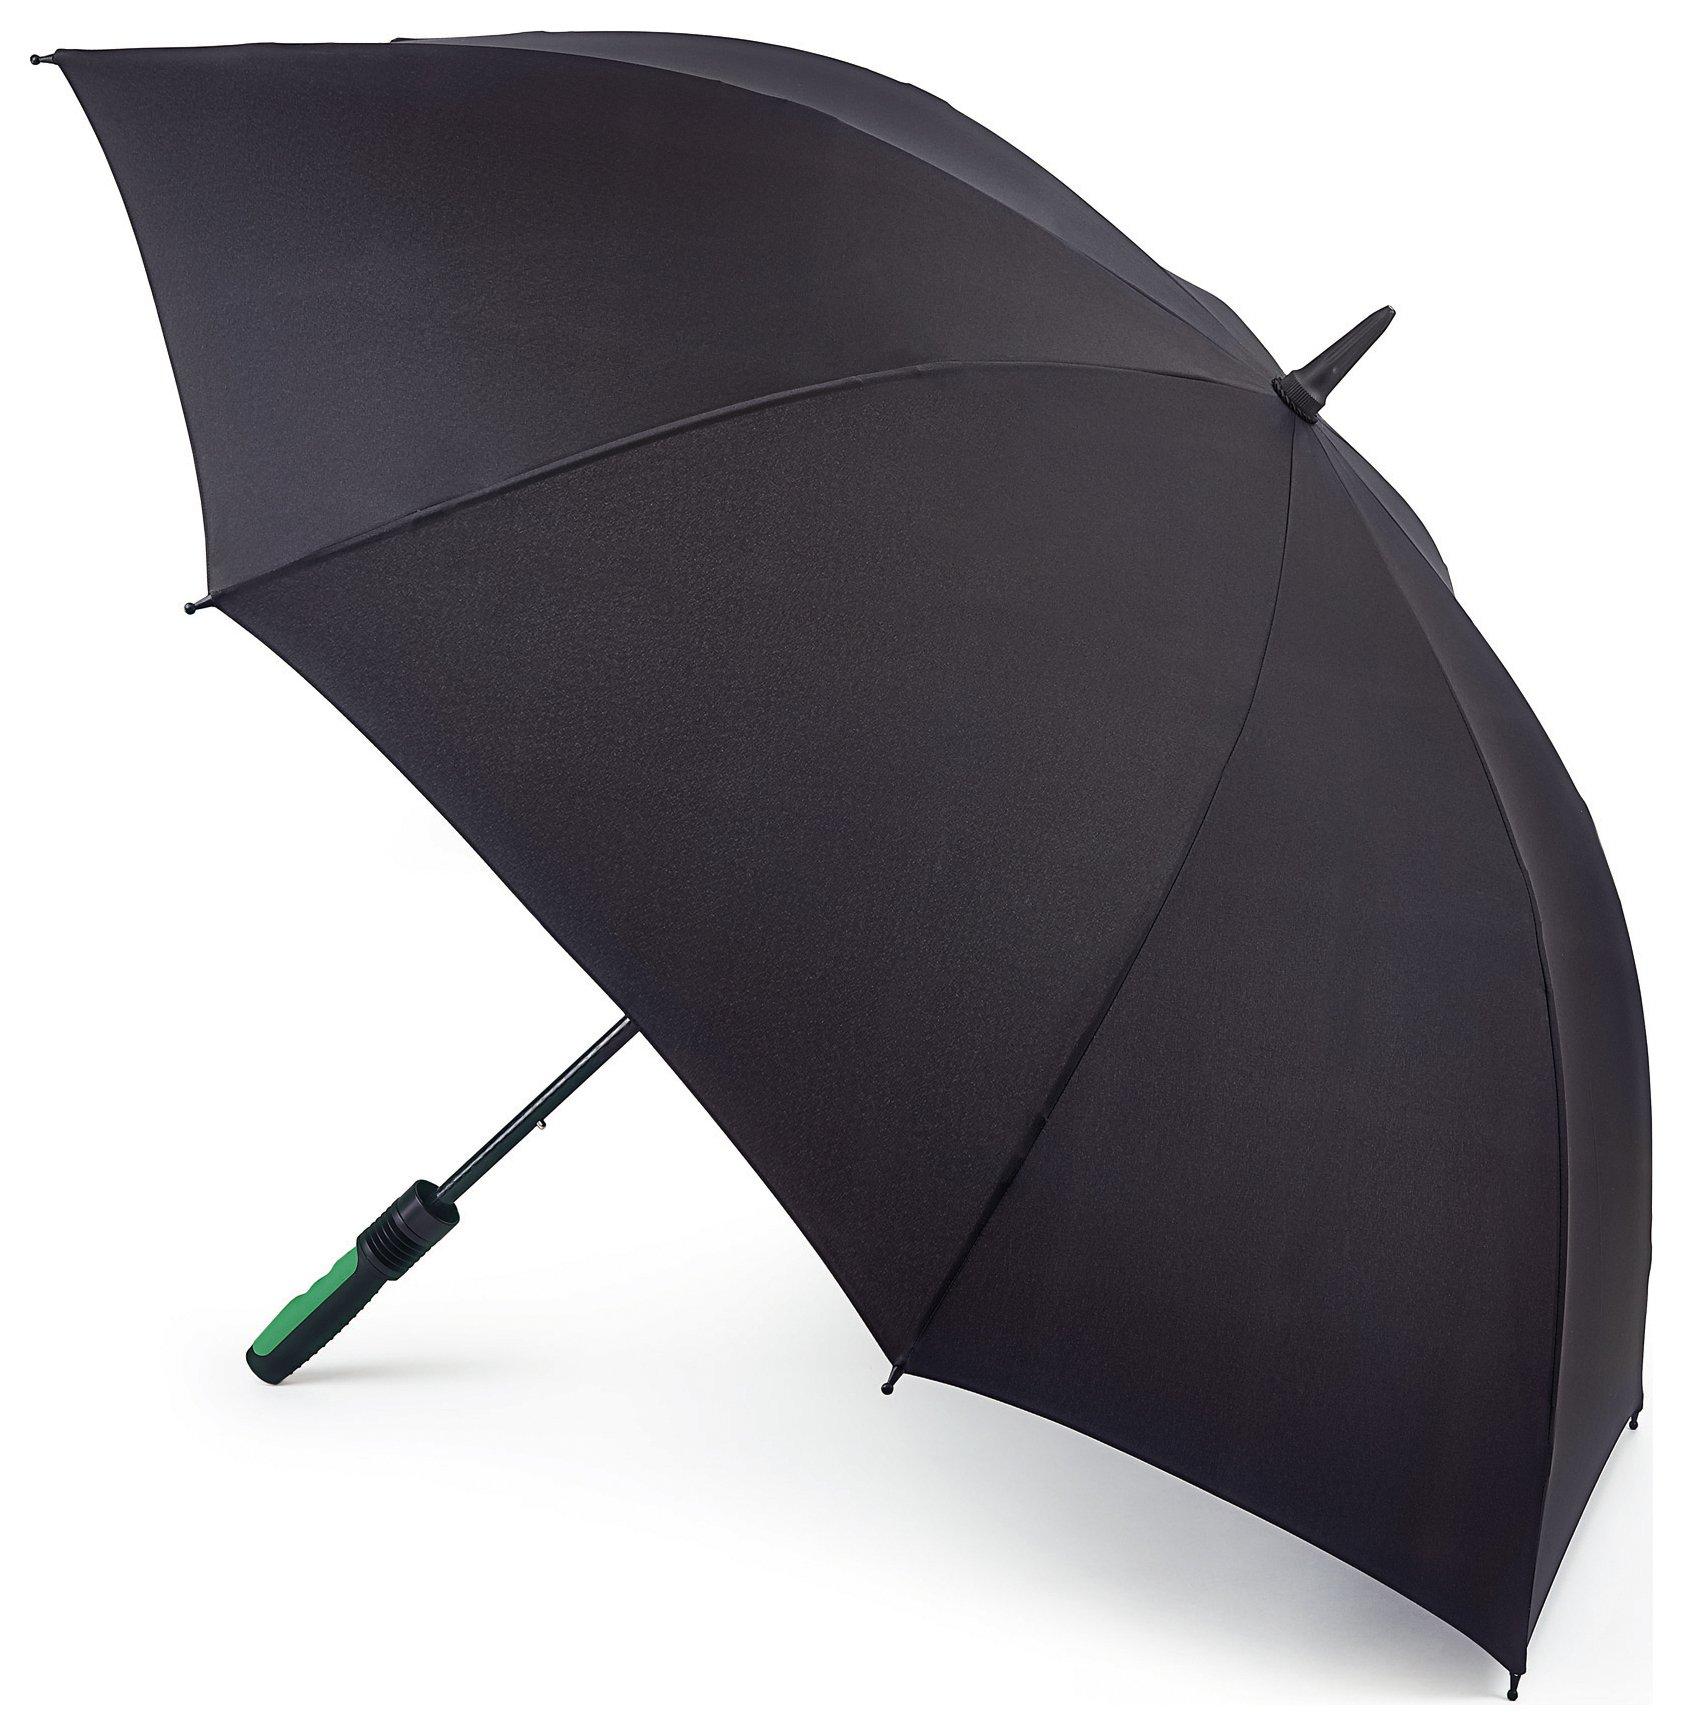 Fulton Cyclone Umbrella - Black